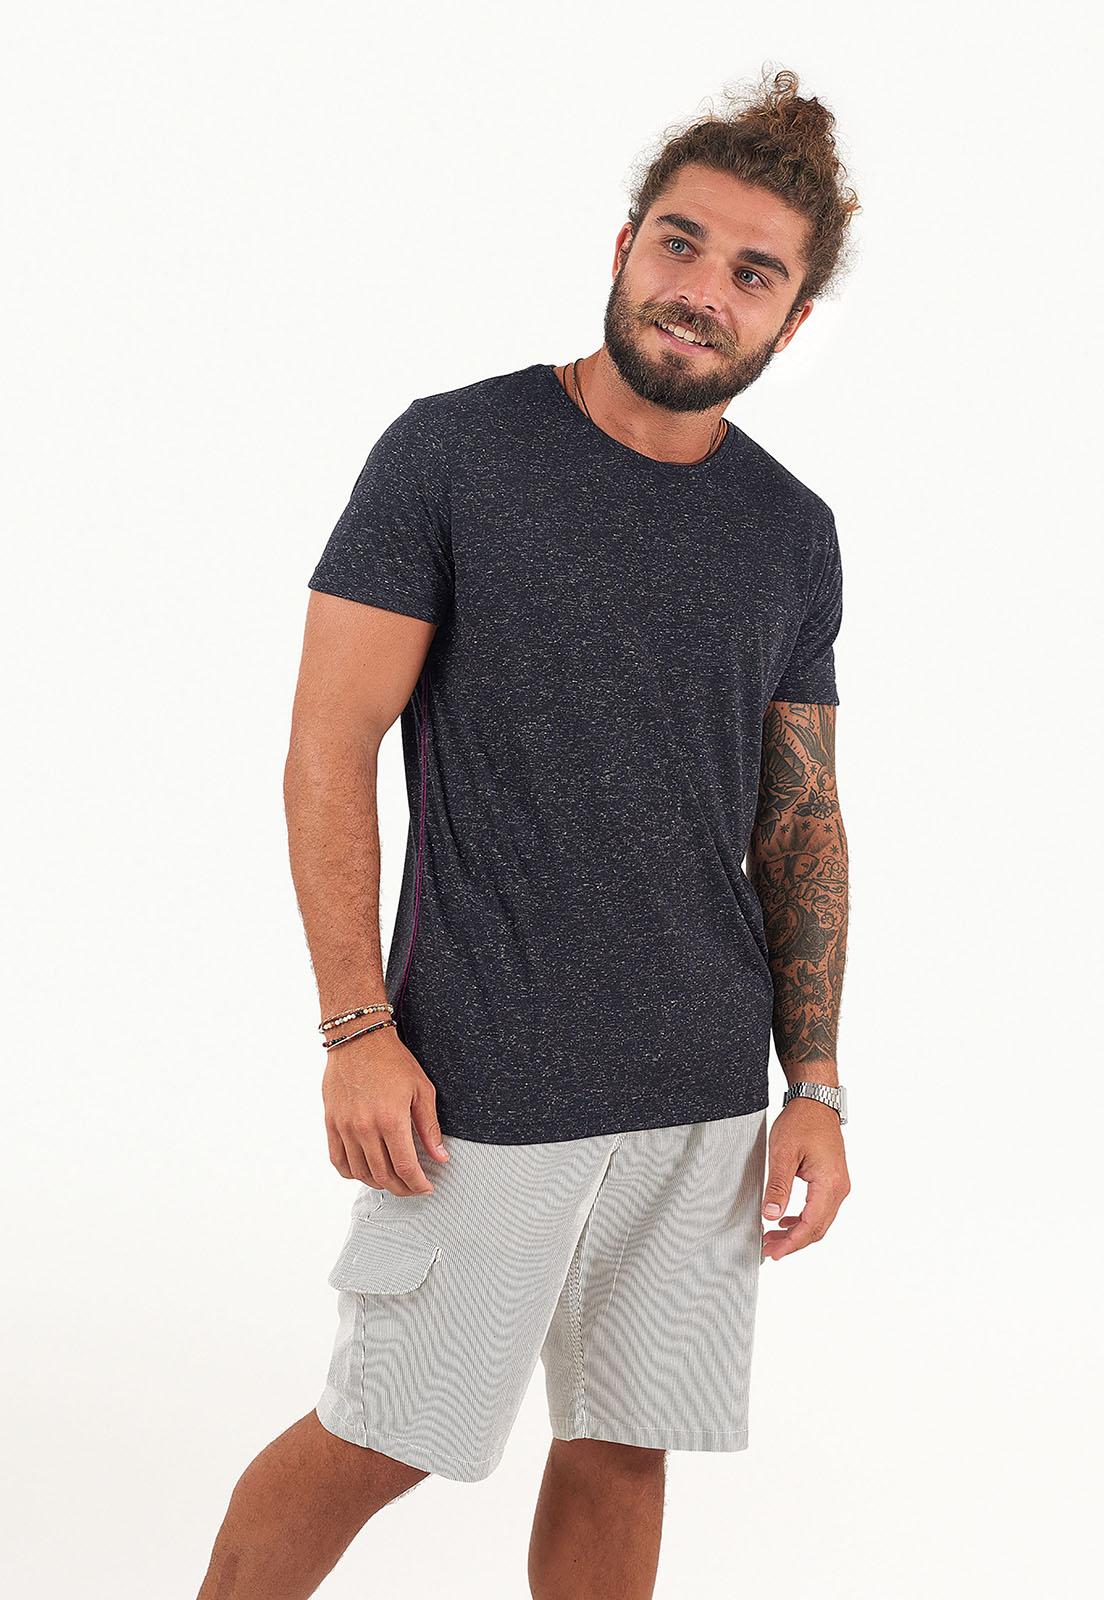 T-shirt Sao Conrado melty  - melty surf & Co.